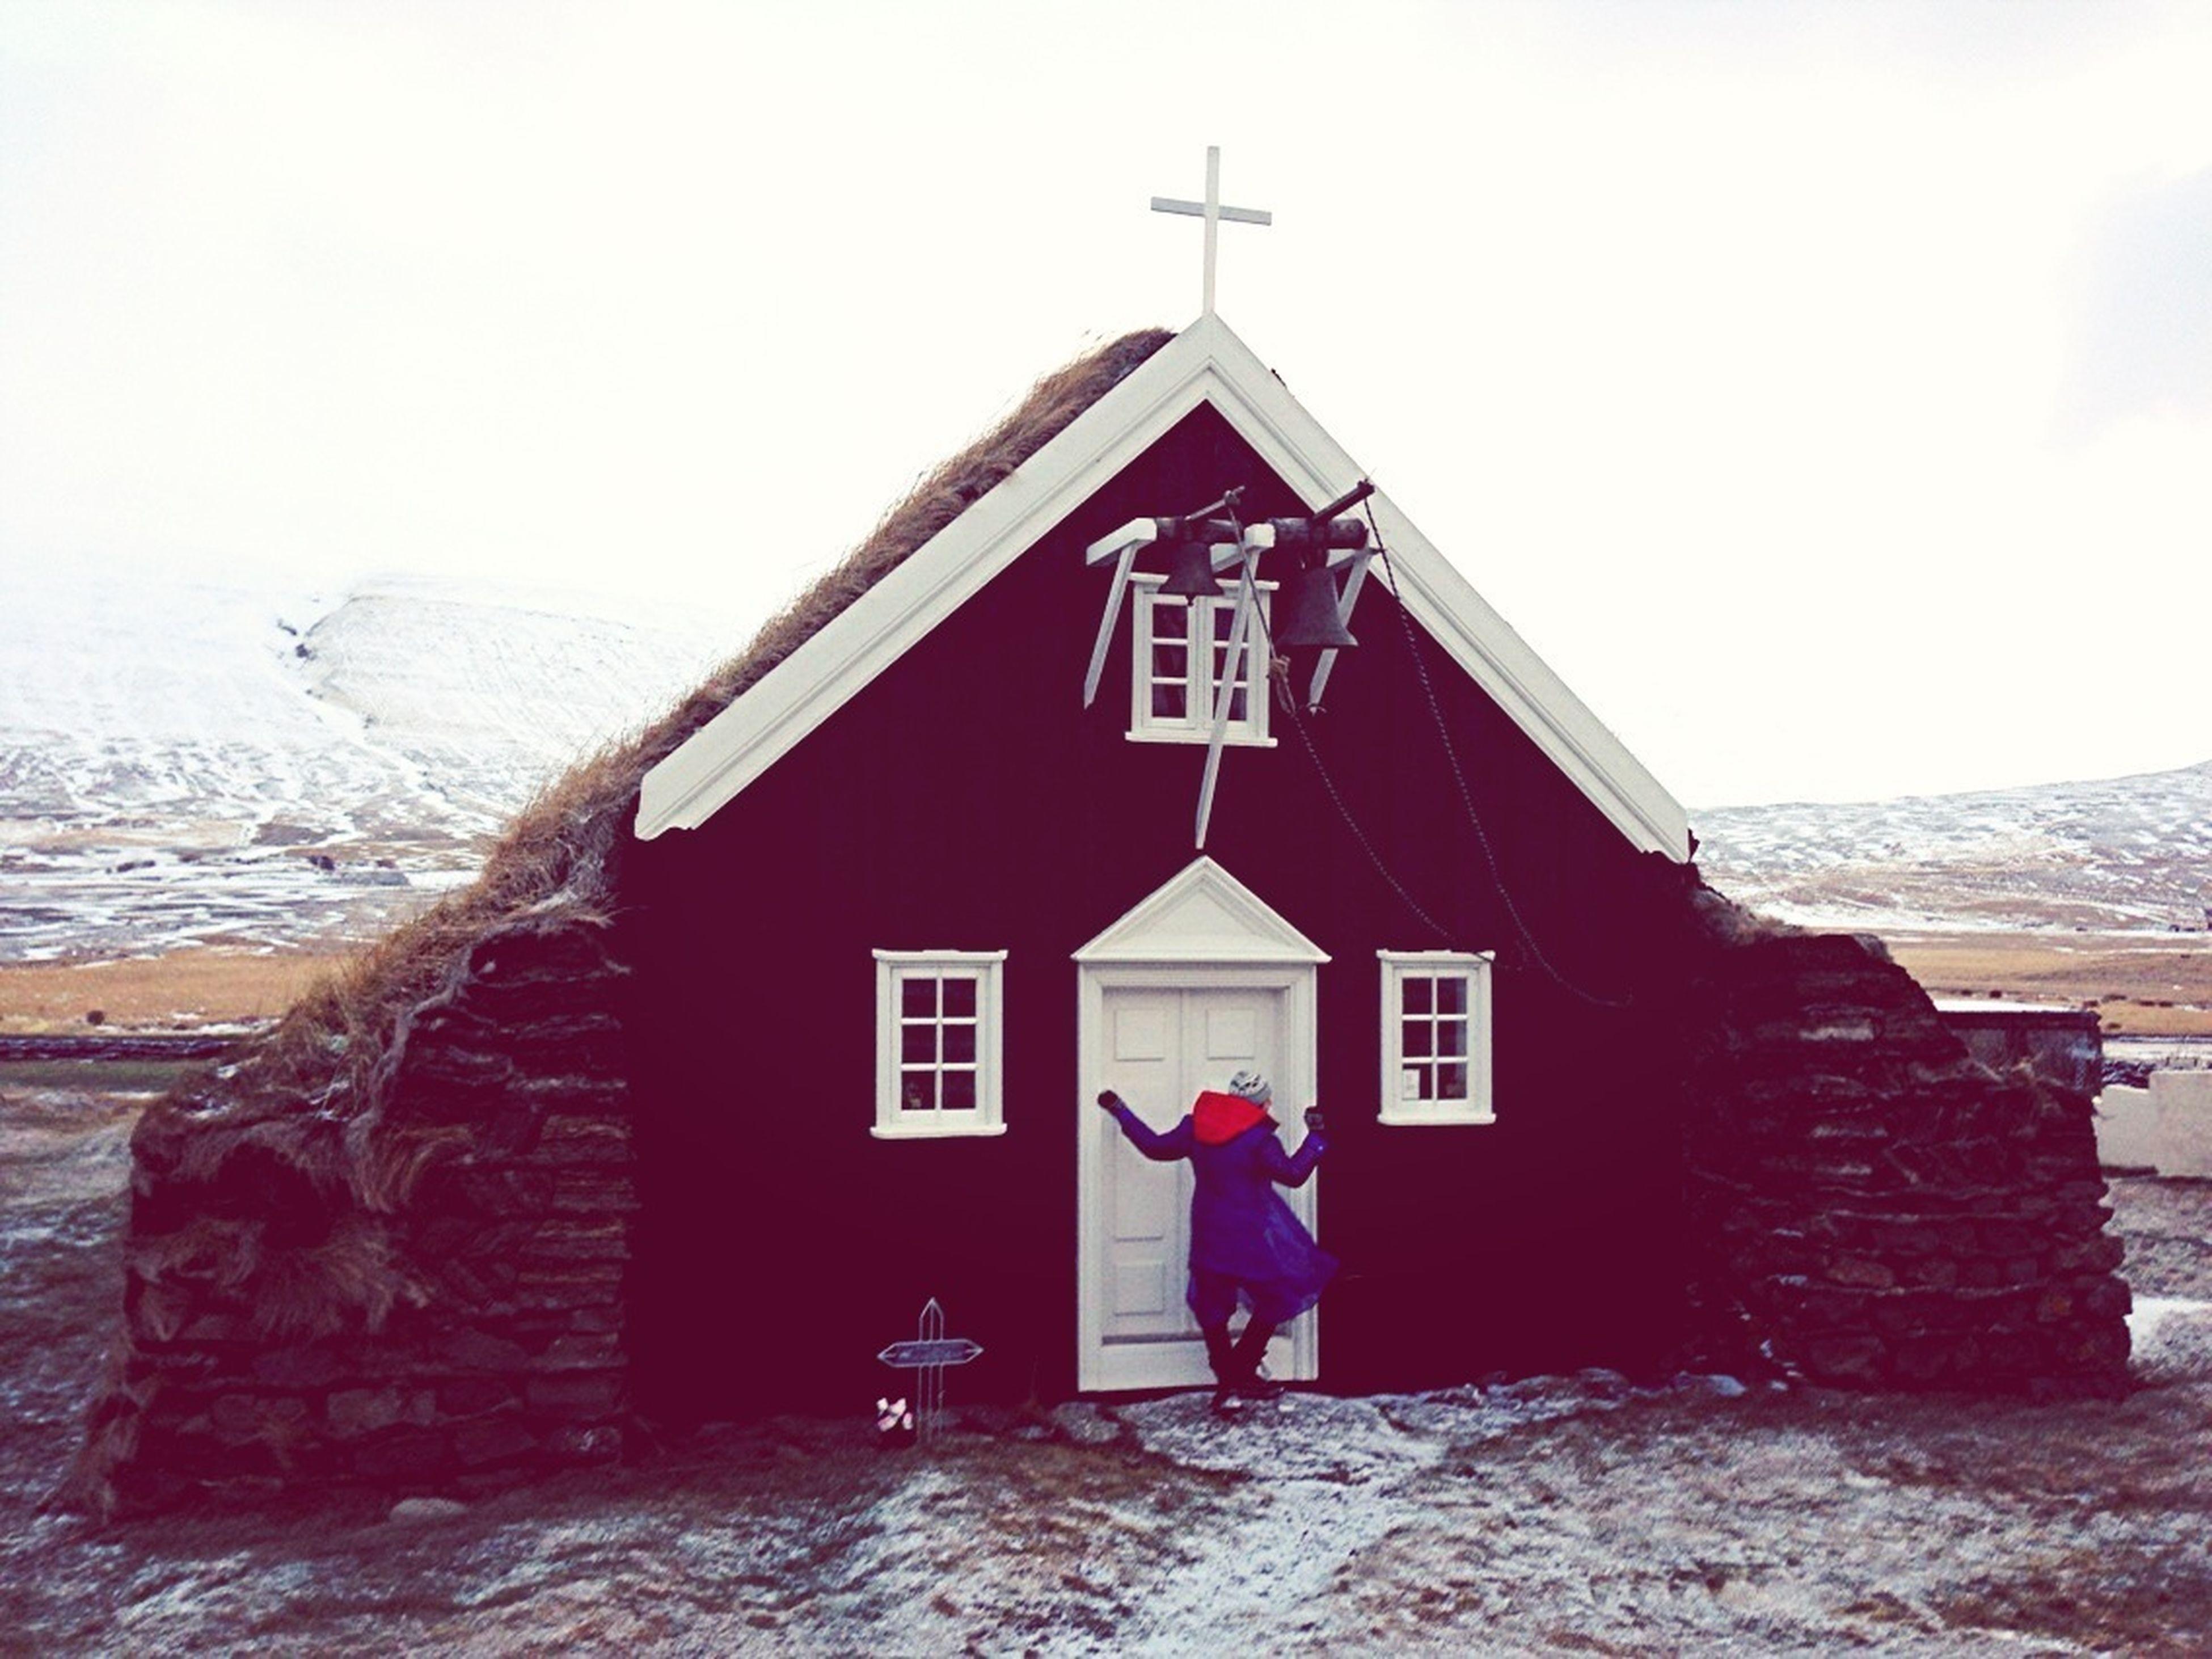 Butoh improvisation in Saurbær (Iceland. Gustavo Thomas © 2012)